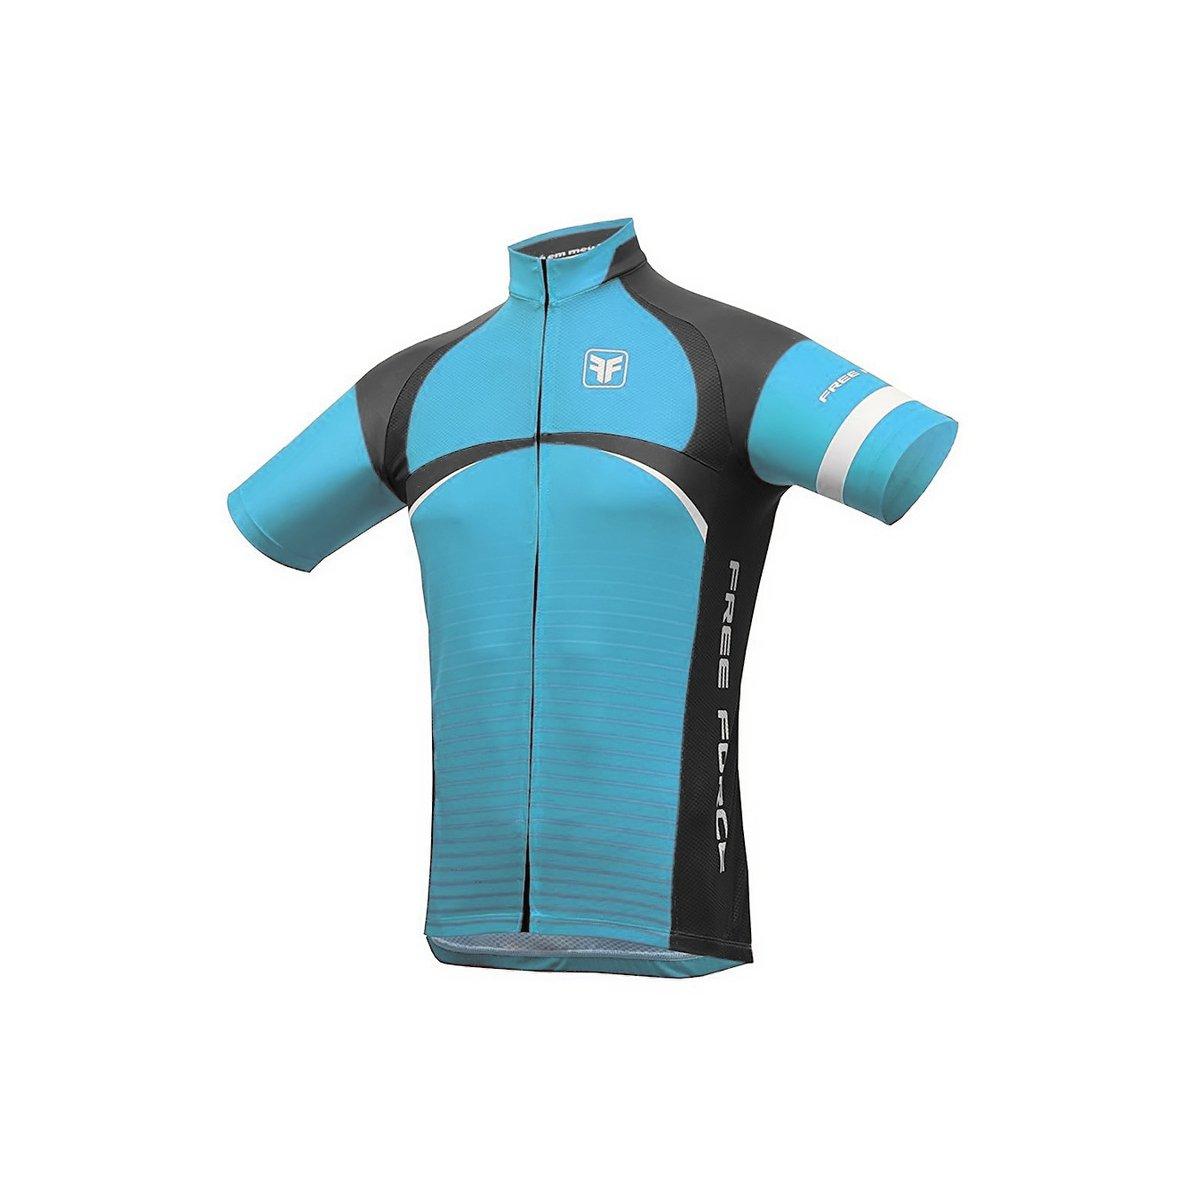 Camisa Camisa Free Ciclista force Azul Range Ciclista Spdp5qw